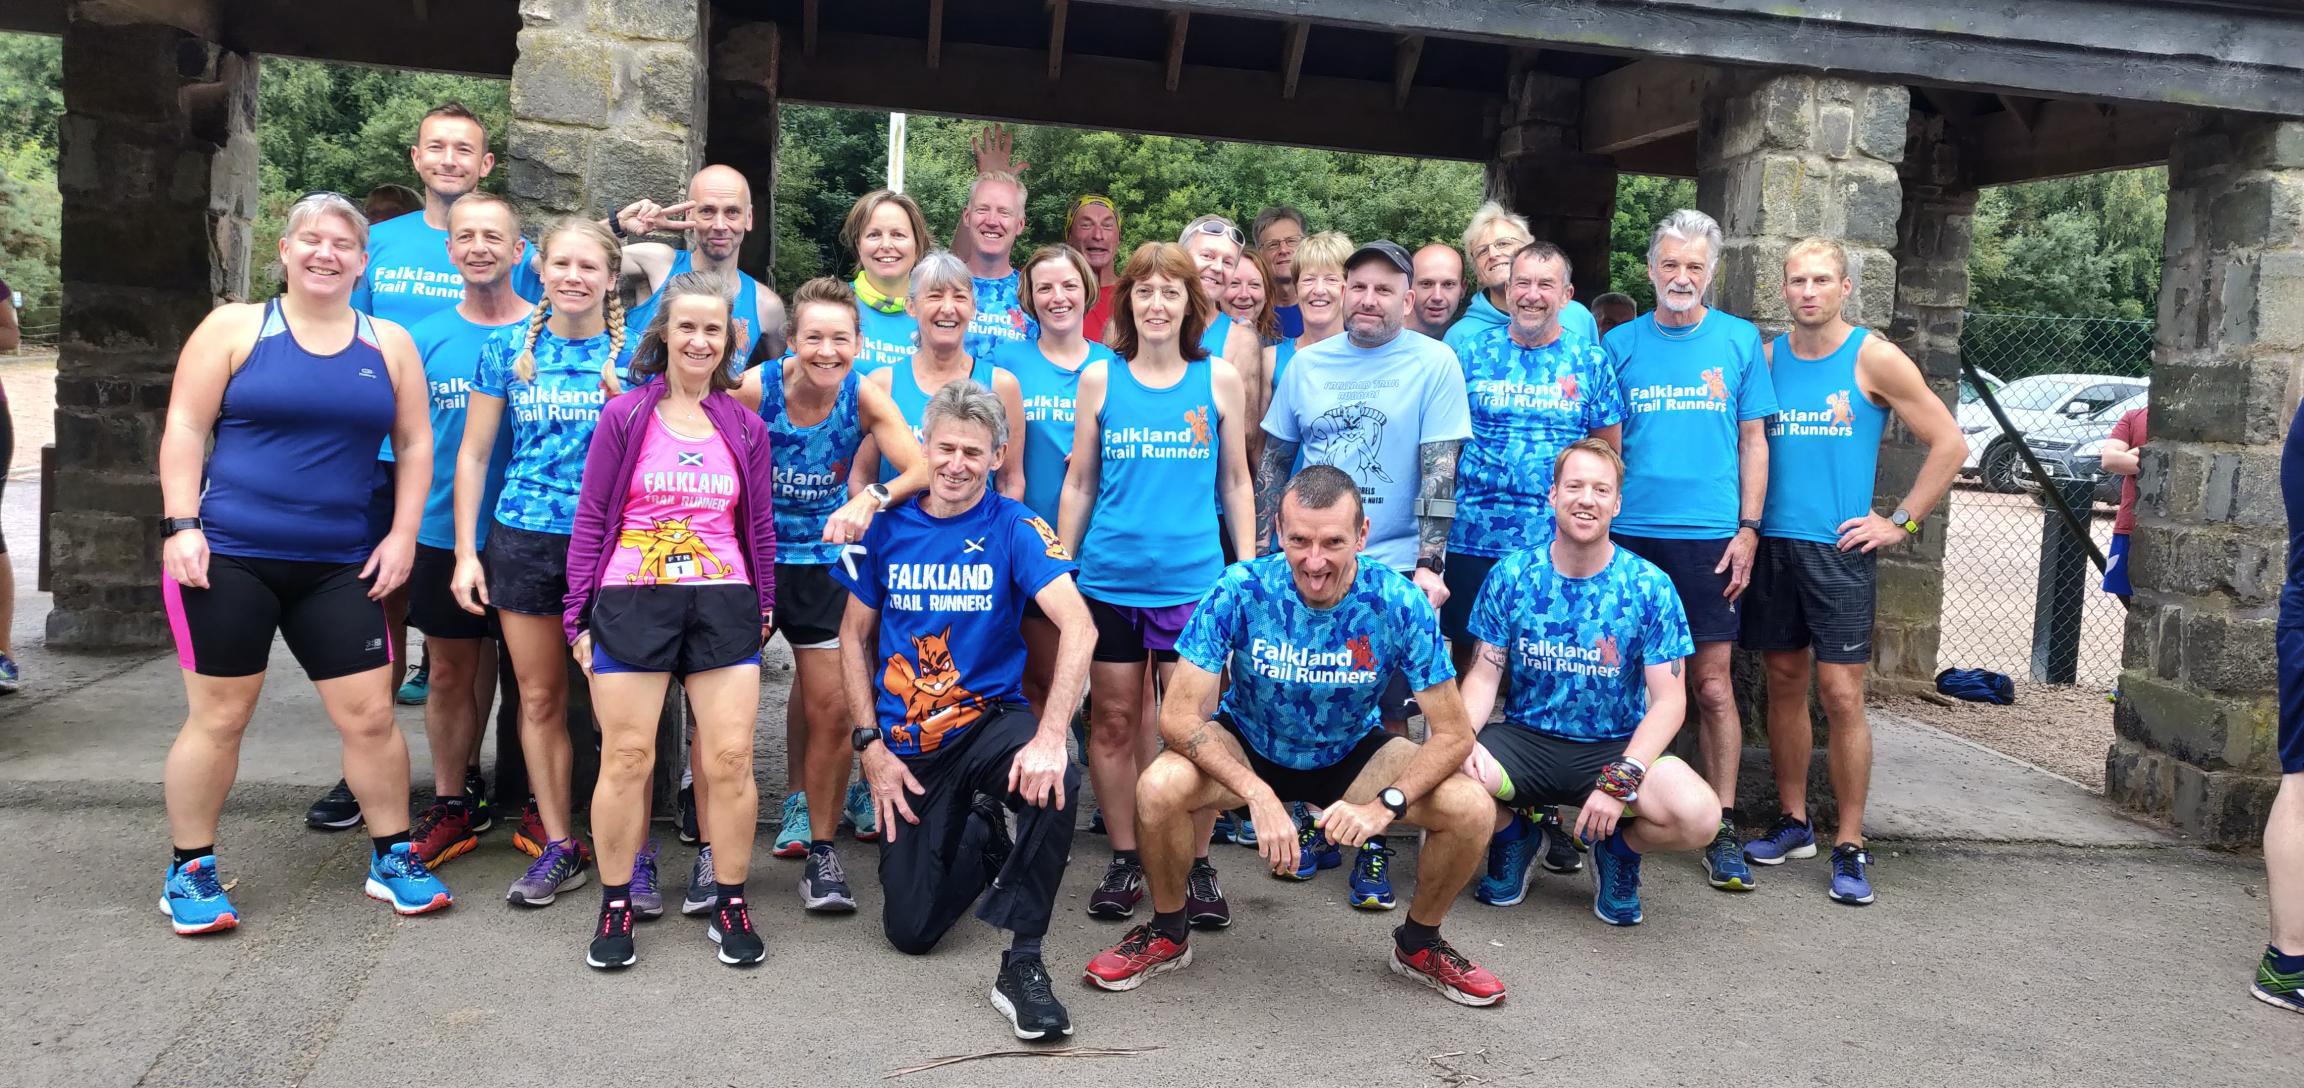 Club Championship Falkland Trail Runners